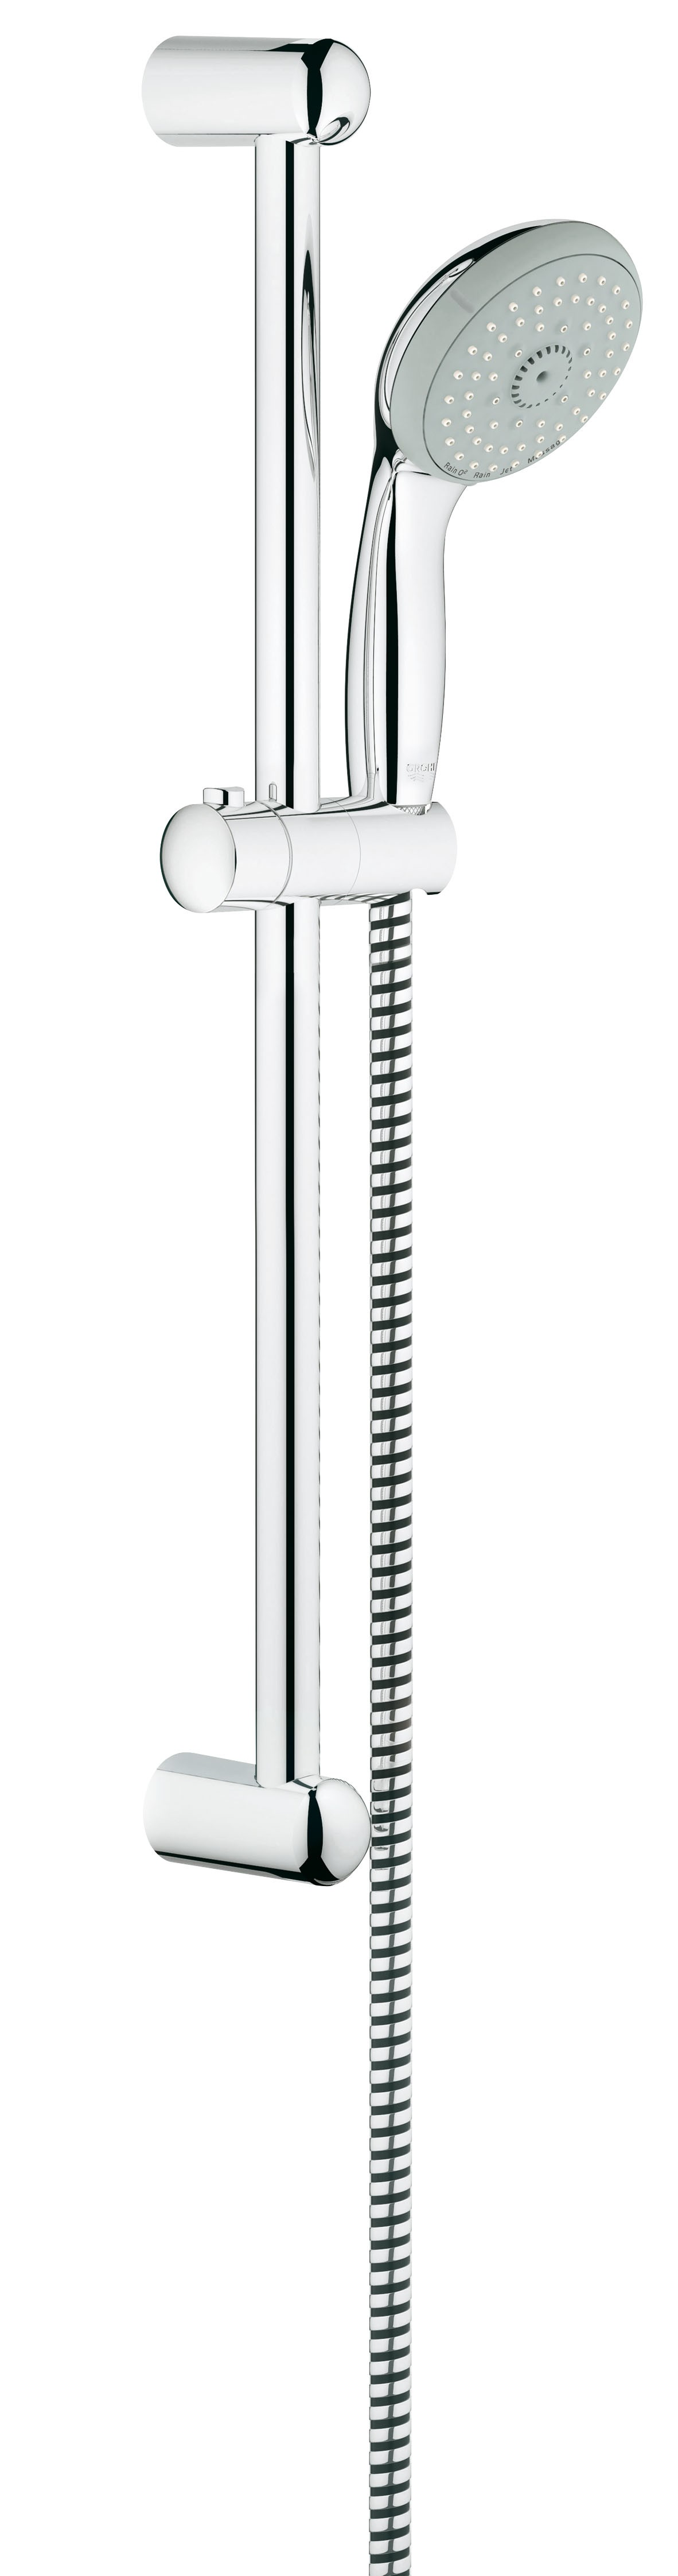 Душевой гарнитур Grohe 27795000 Tempesta Classic (ручной душ, штанга 600 мм, шланг 1750 мм), хром